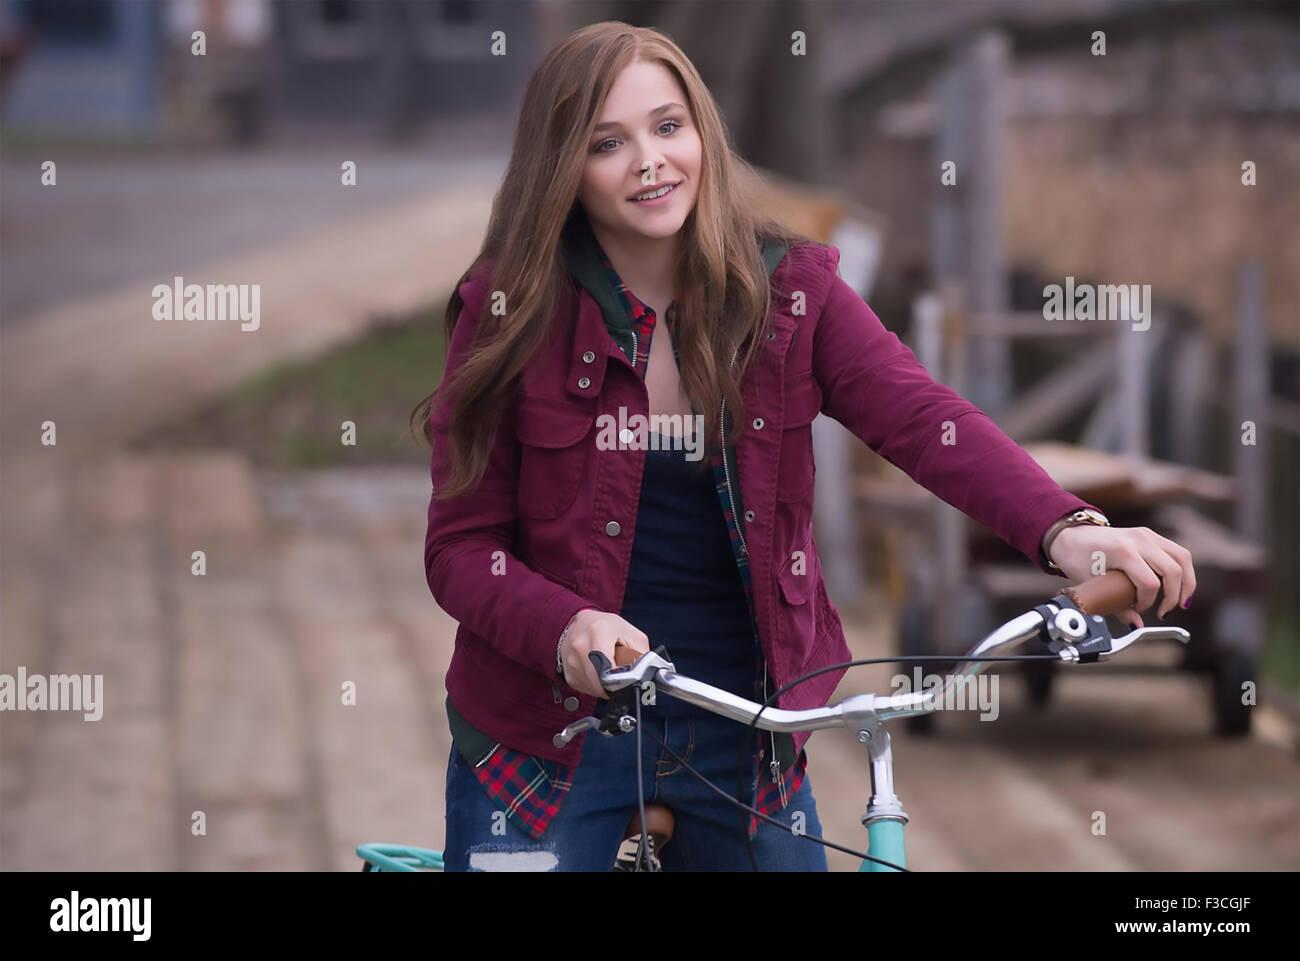 IF I STAY  2014 Warner Bros/Metro-Goldwyn-Mayer film with Chloe Grace Moretz - Stock Image